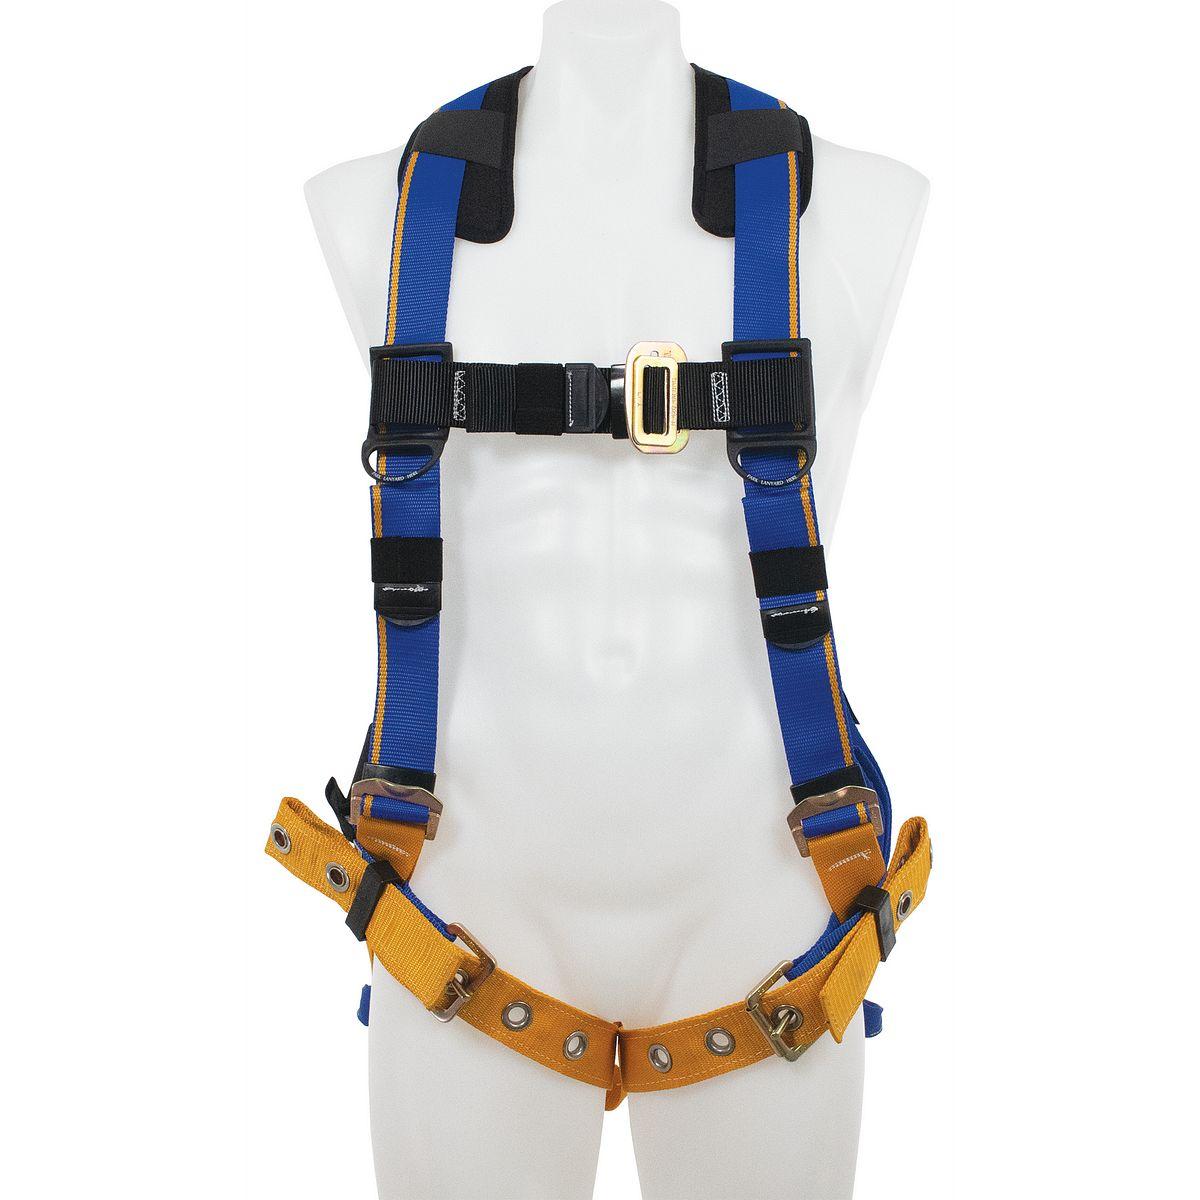 H2120_PI?crop=no&u=qlpvmu harnesses werner ladders